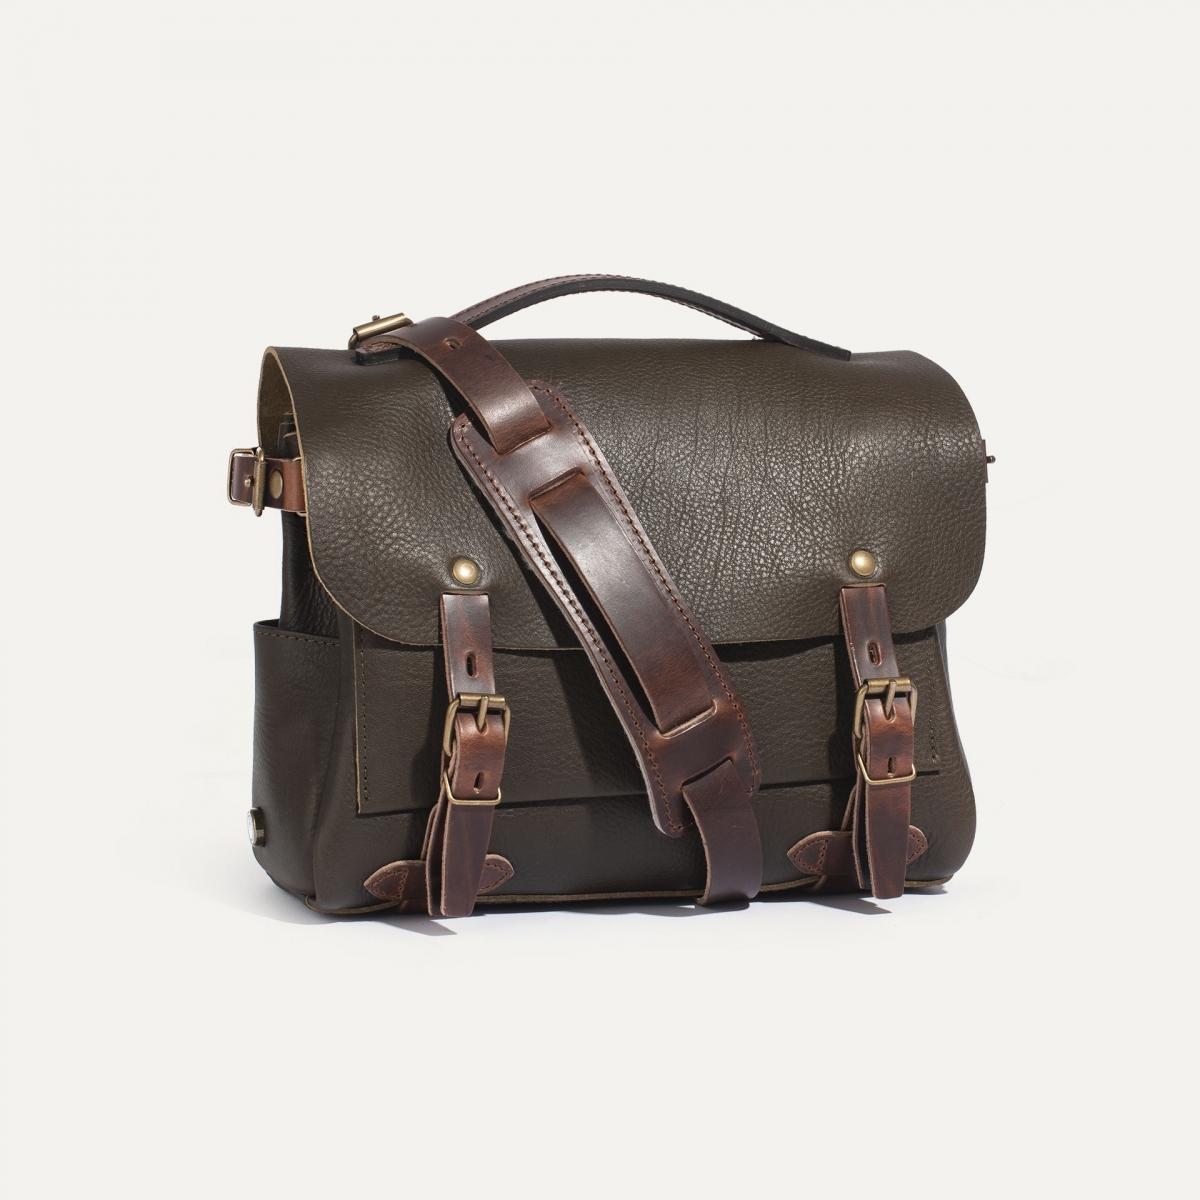 Postman bag Éclair S - Khaki (image n°2)